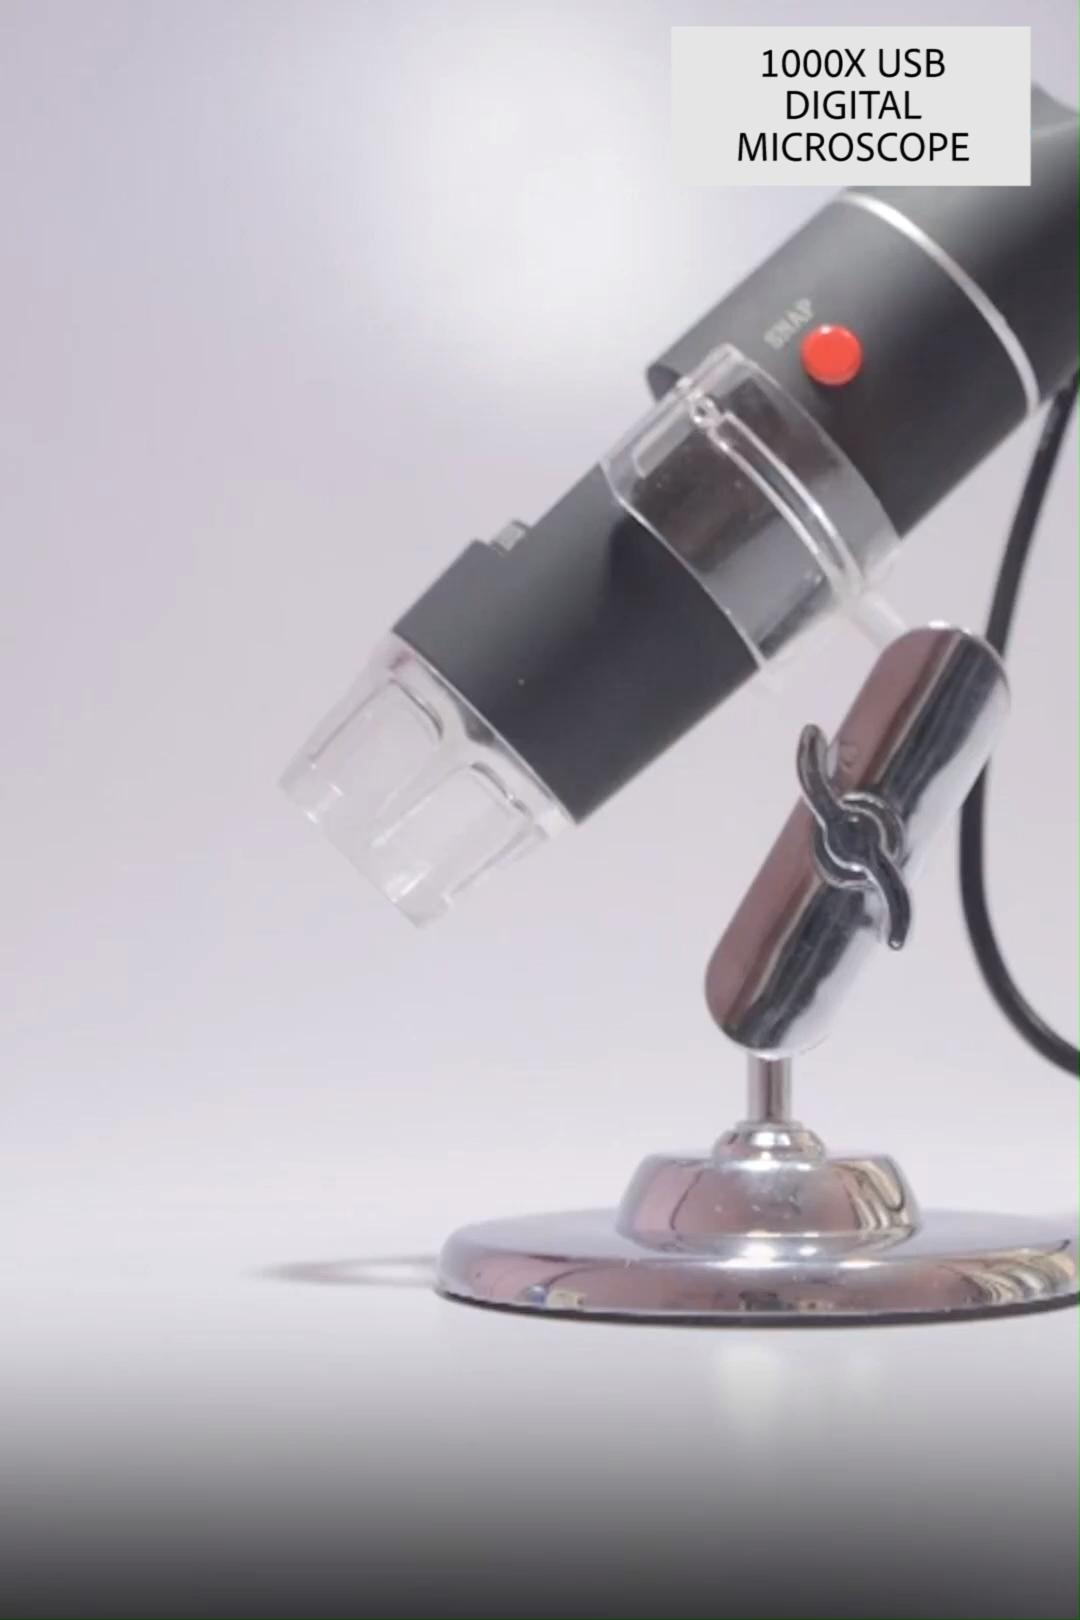 1000x Zoom 1080p Microscope Camera In 2020 Usb Microscope